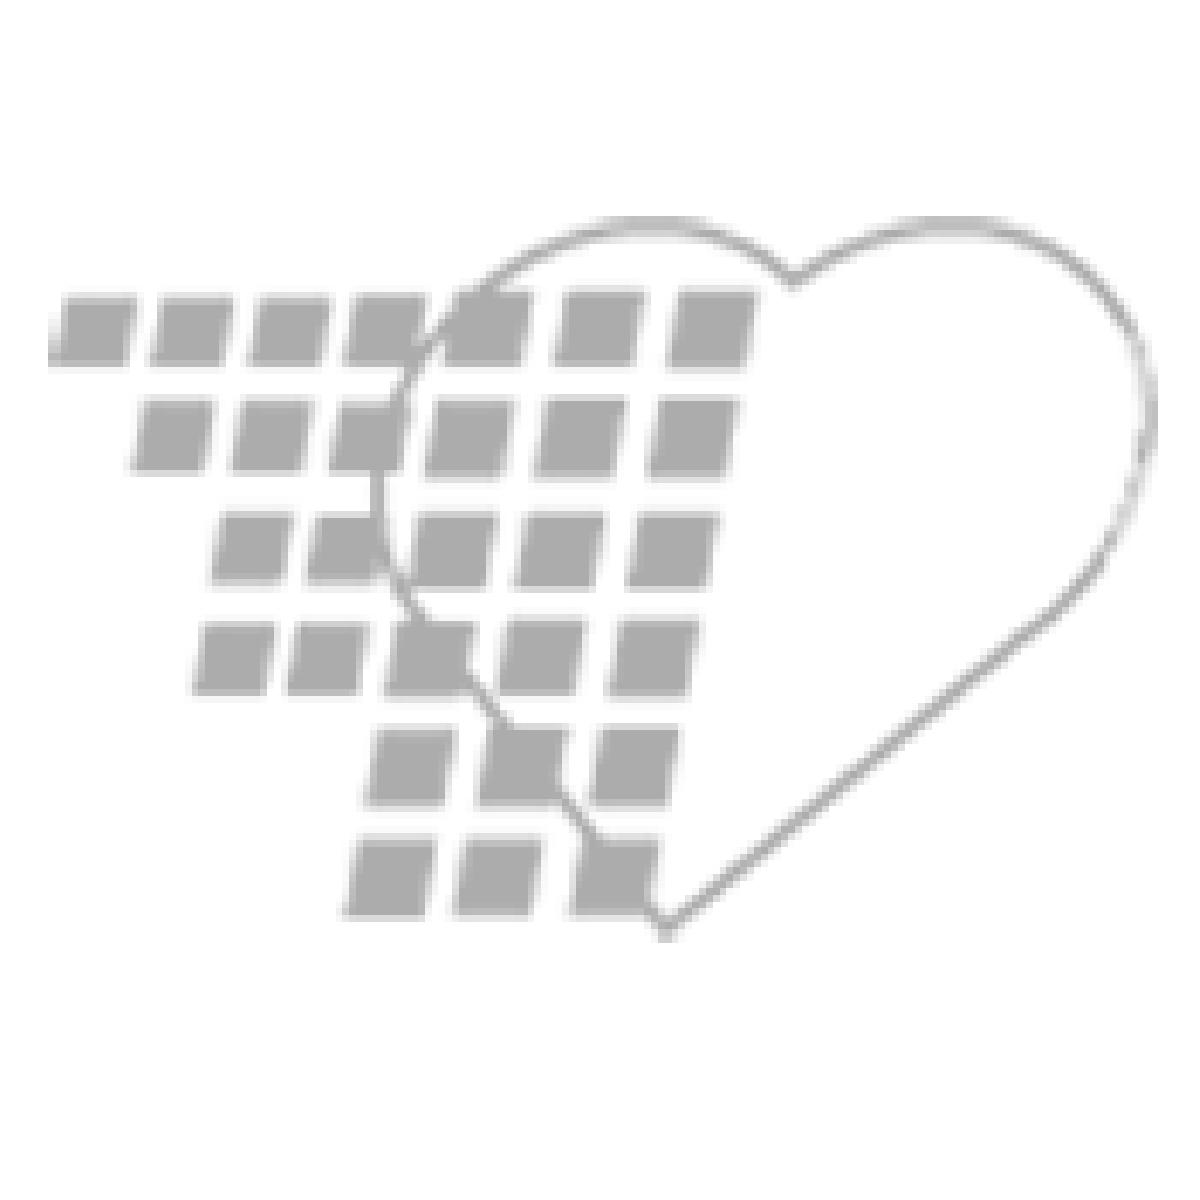 11-81-9516 Intra-Uterine Development Trainer